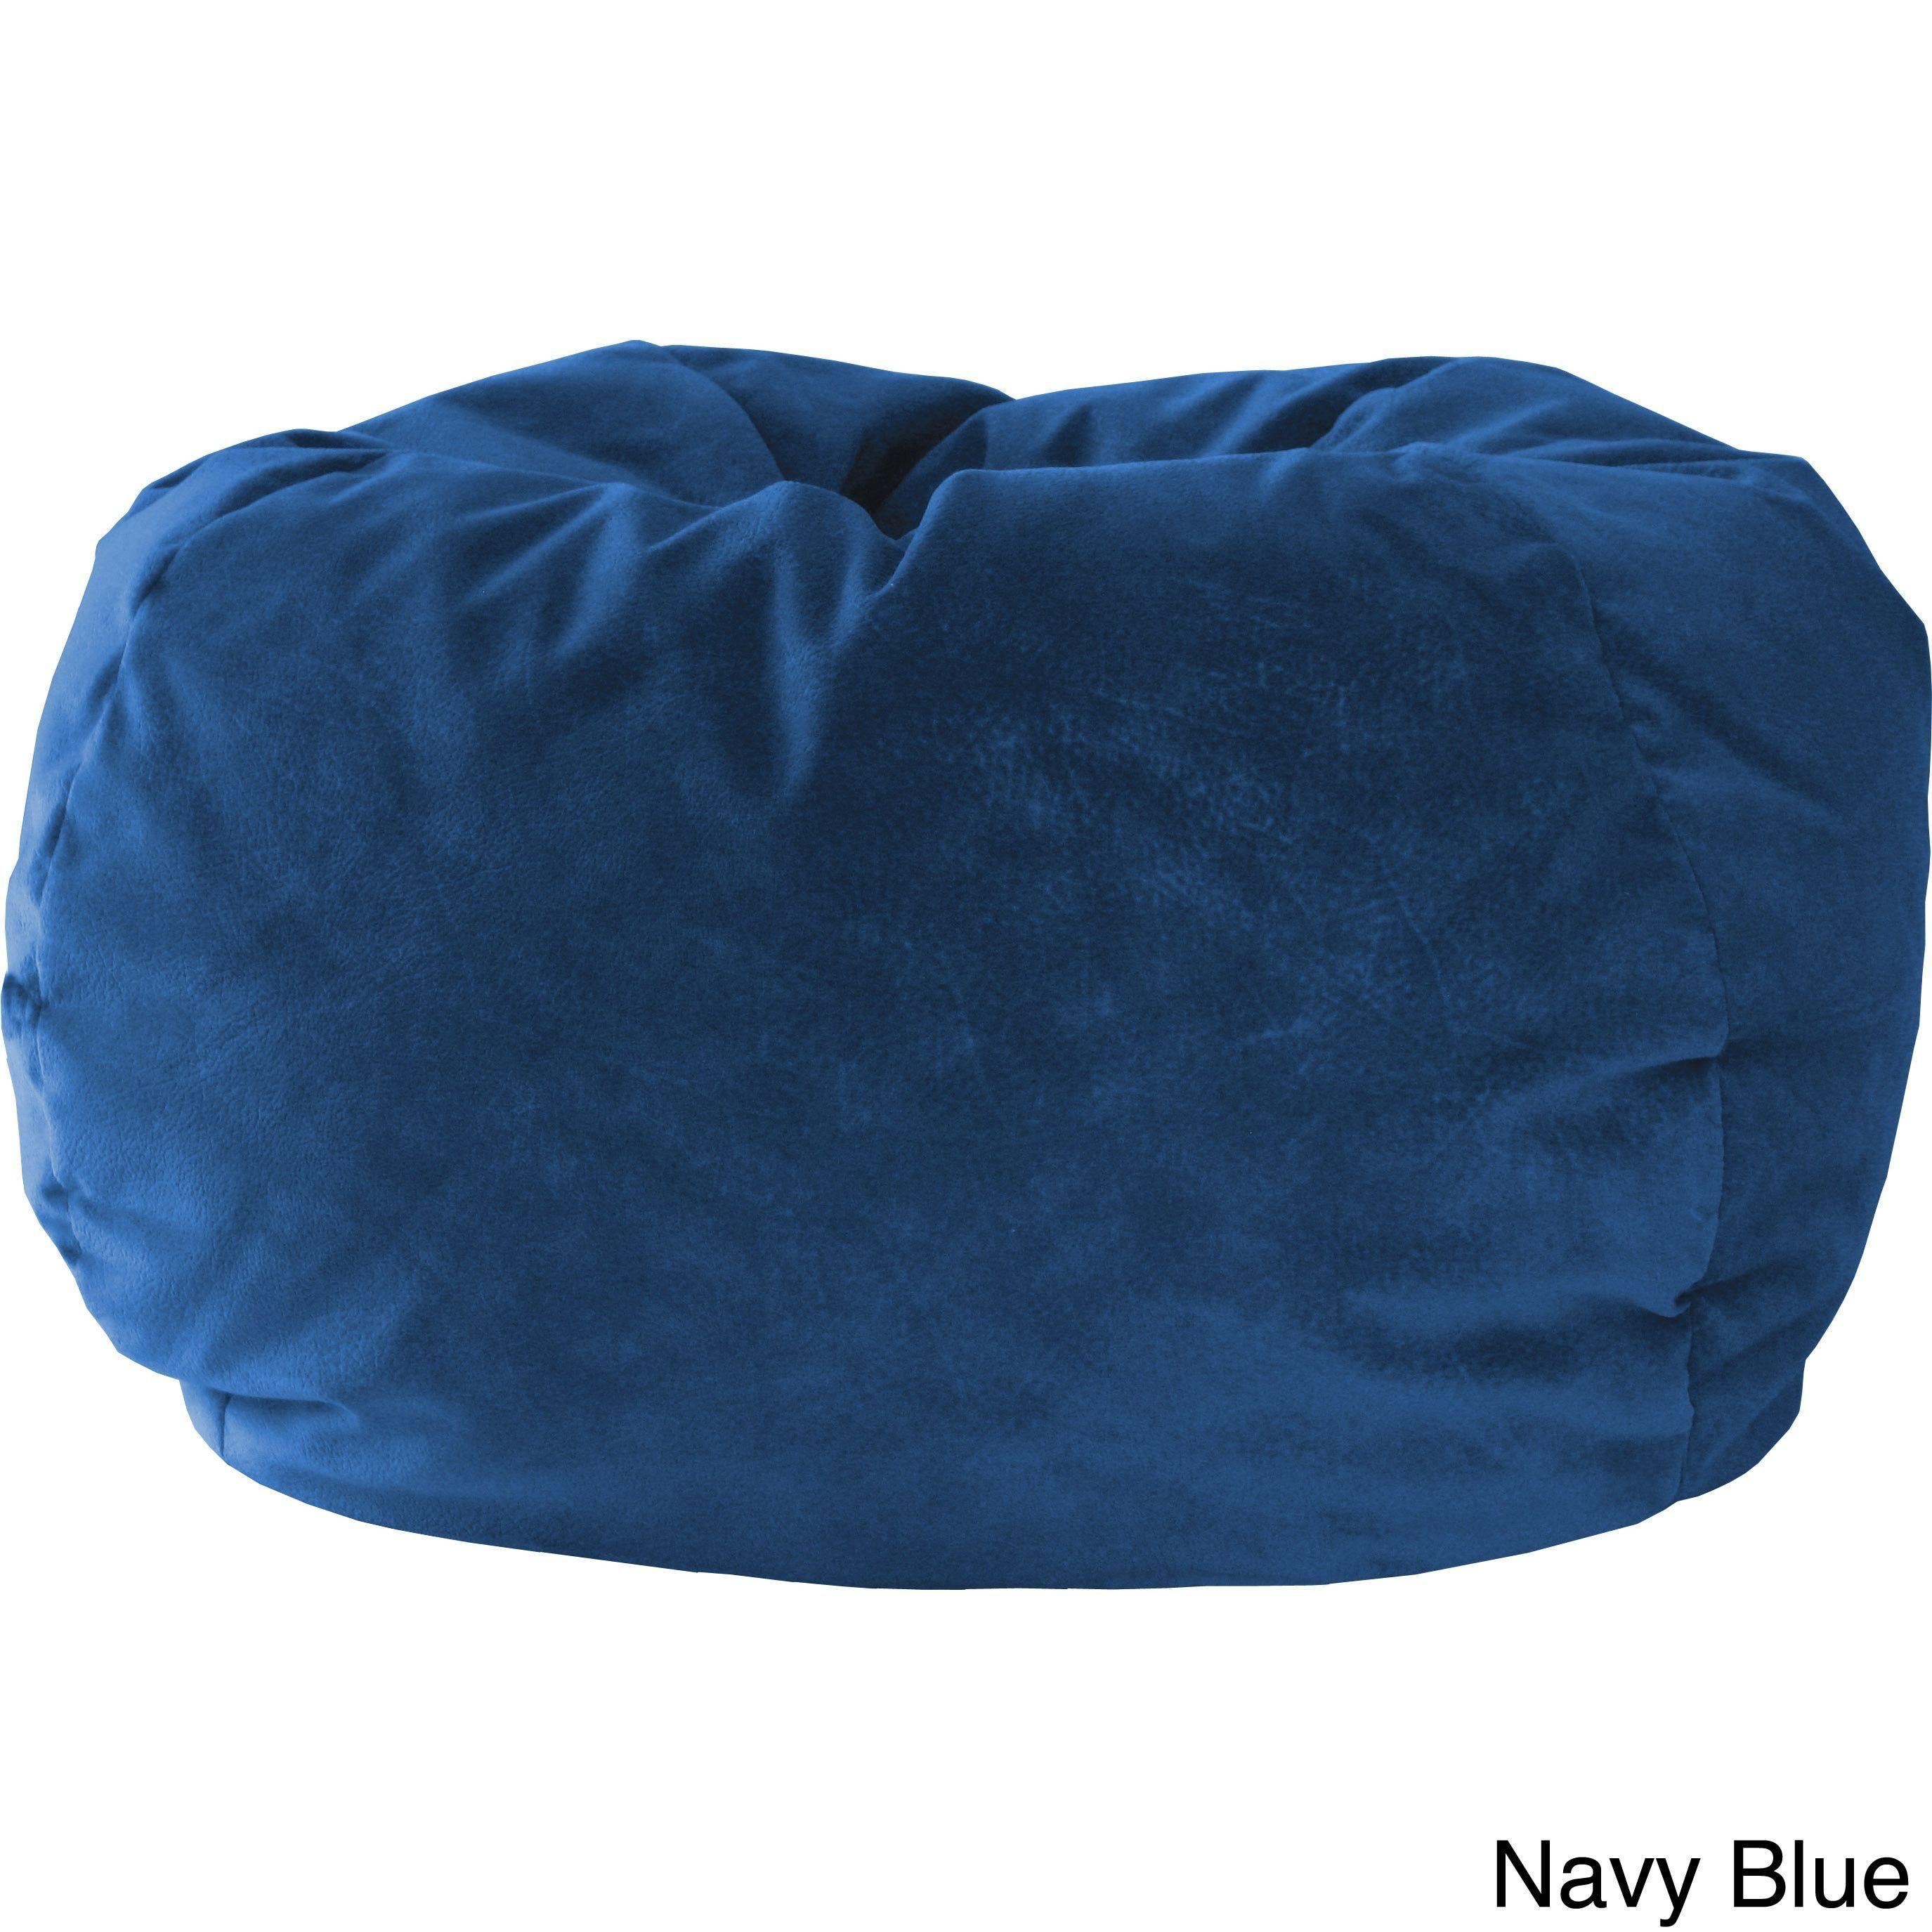 Terrific Xxl Micro Fiber Suede Bean Bag Cocoa Black Hudson Beatyapartments Chair Design Images Beatyapartmentscom